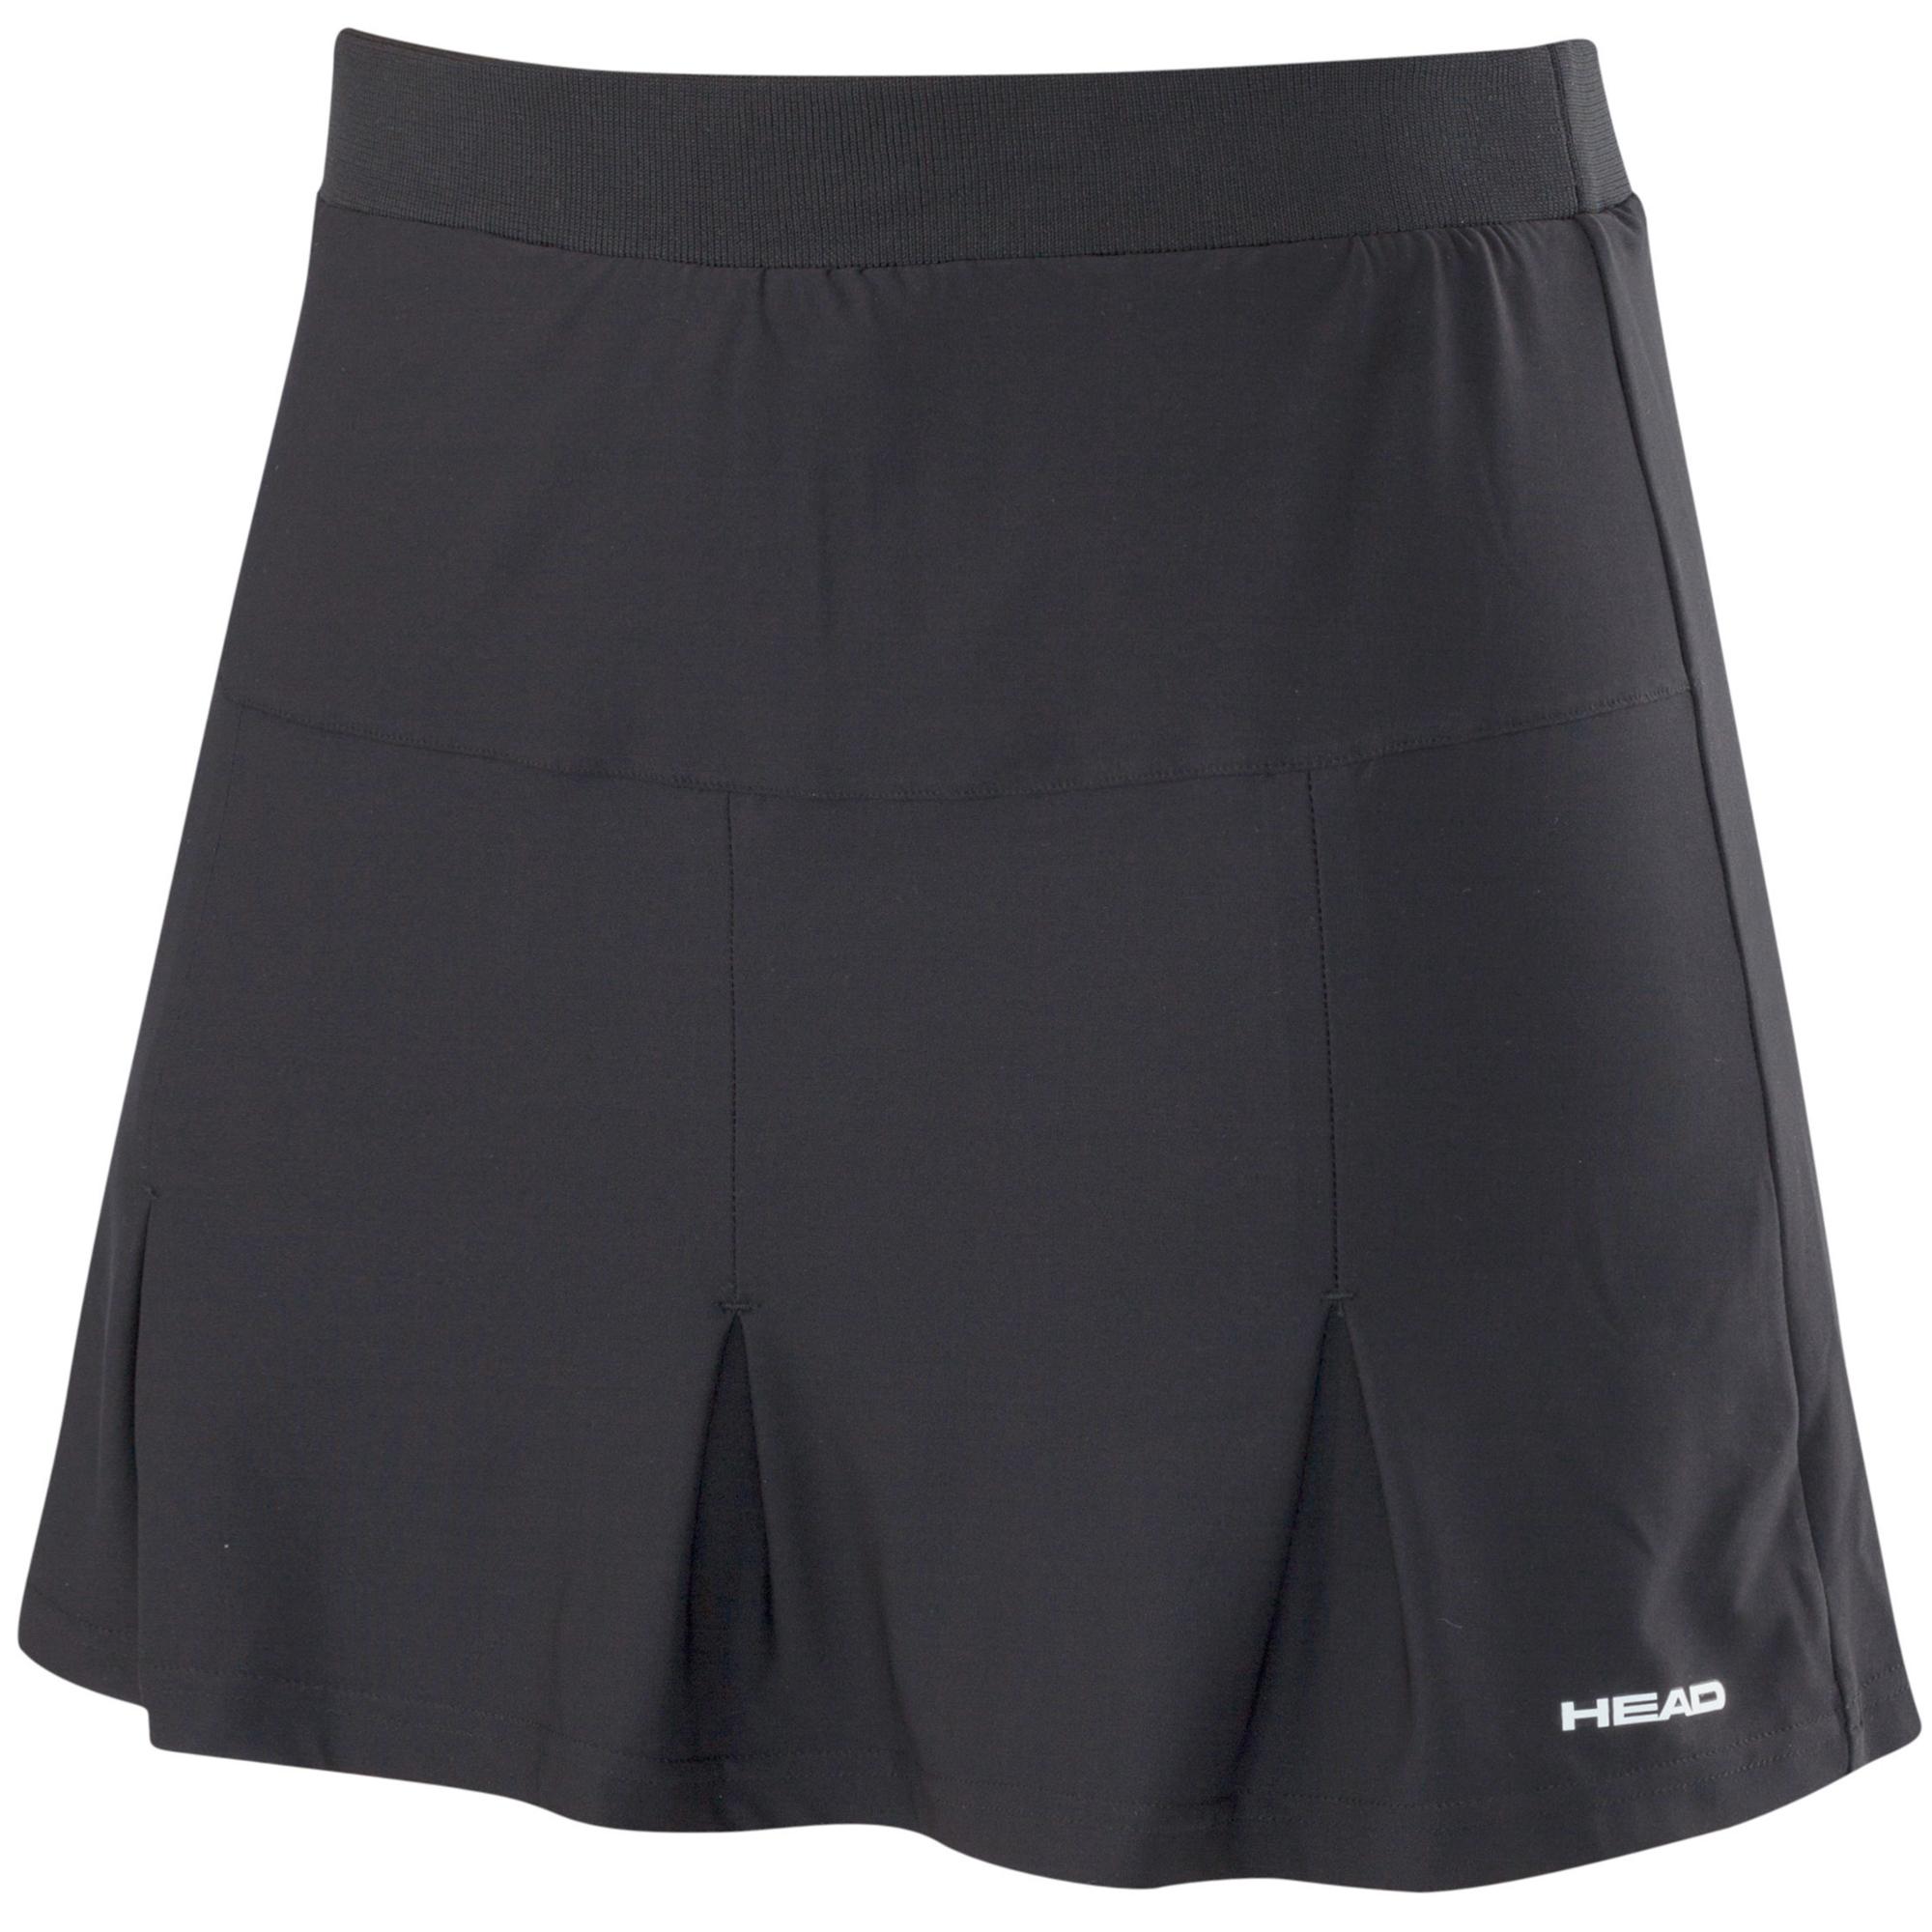 Head Club Basic Ladies Long Skort - Black, XS